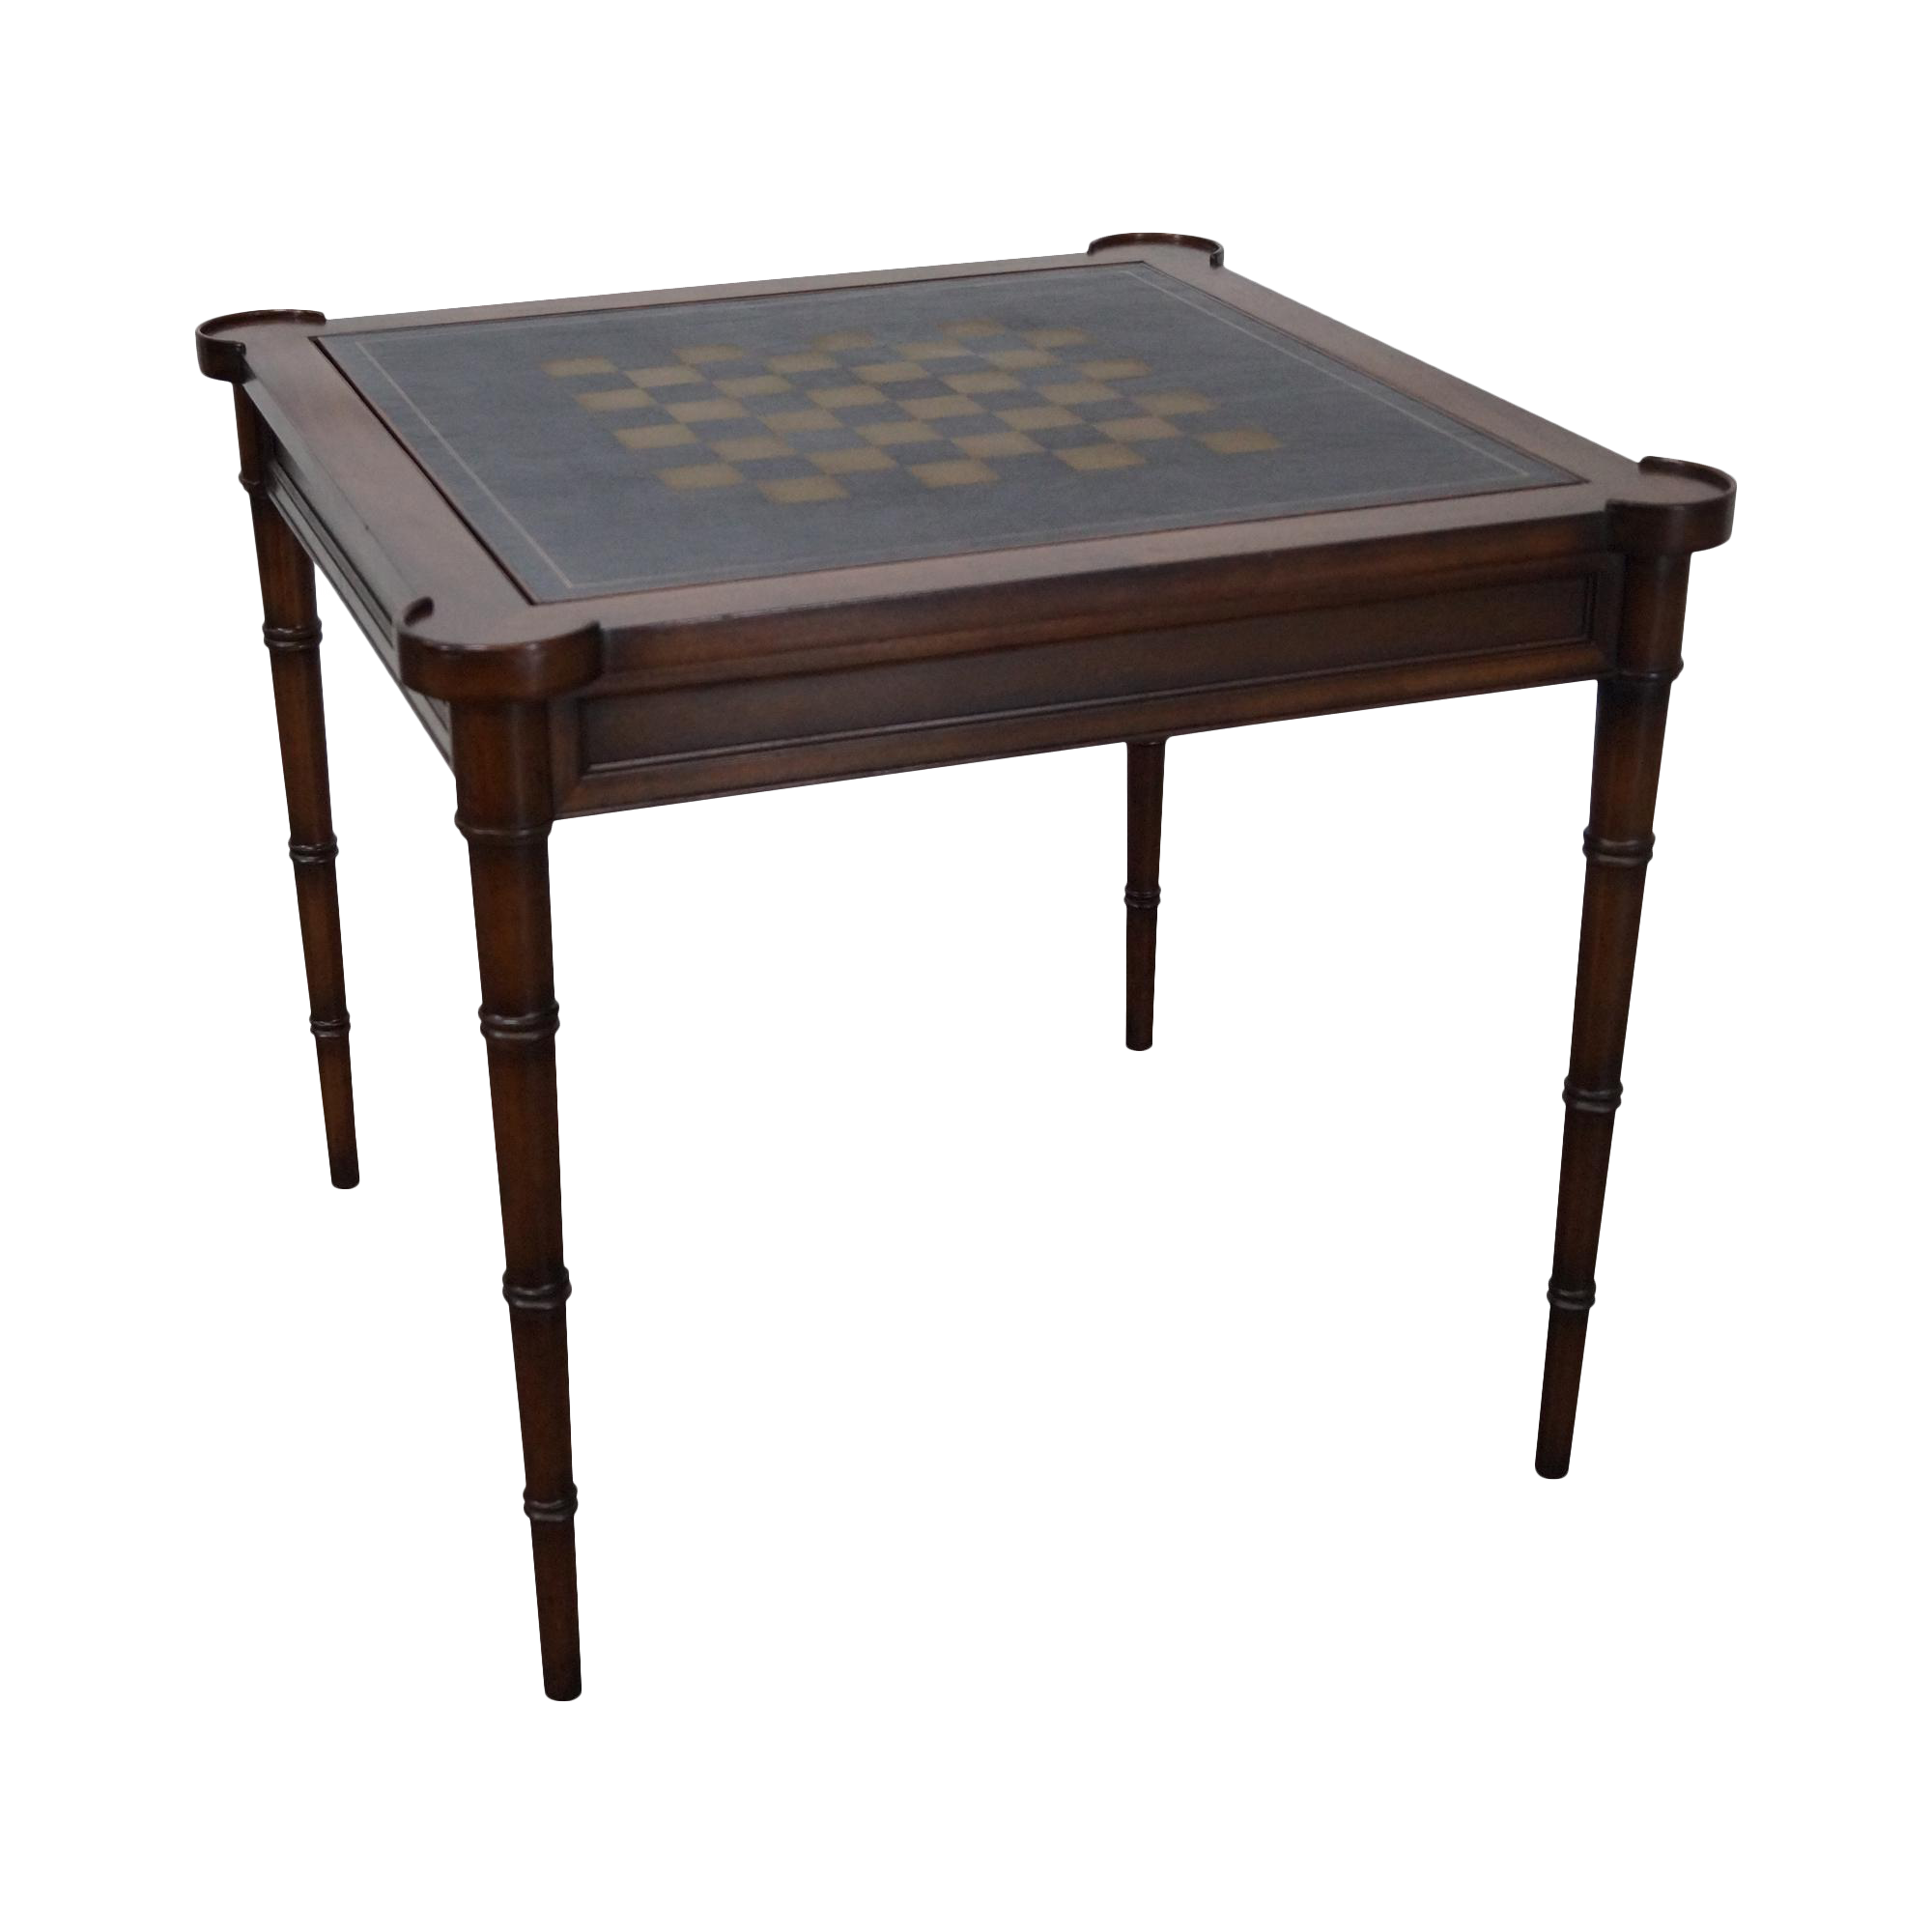 Drexel Heritage Faux Bamboo Leg Reversible Checker Board